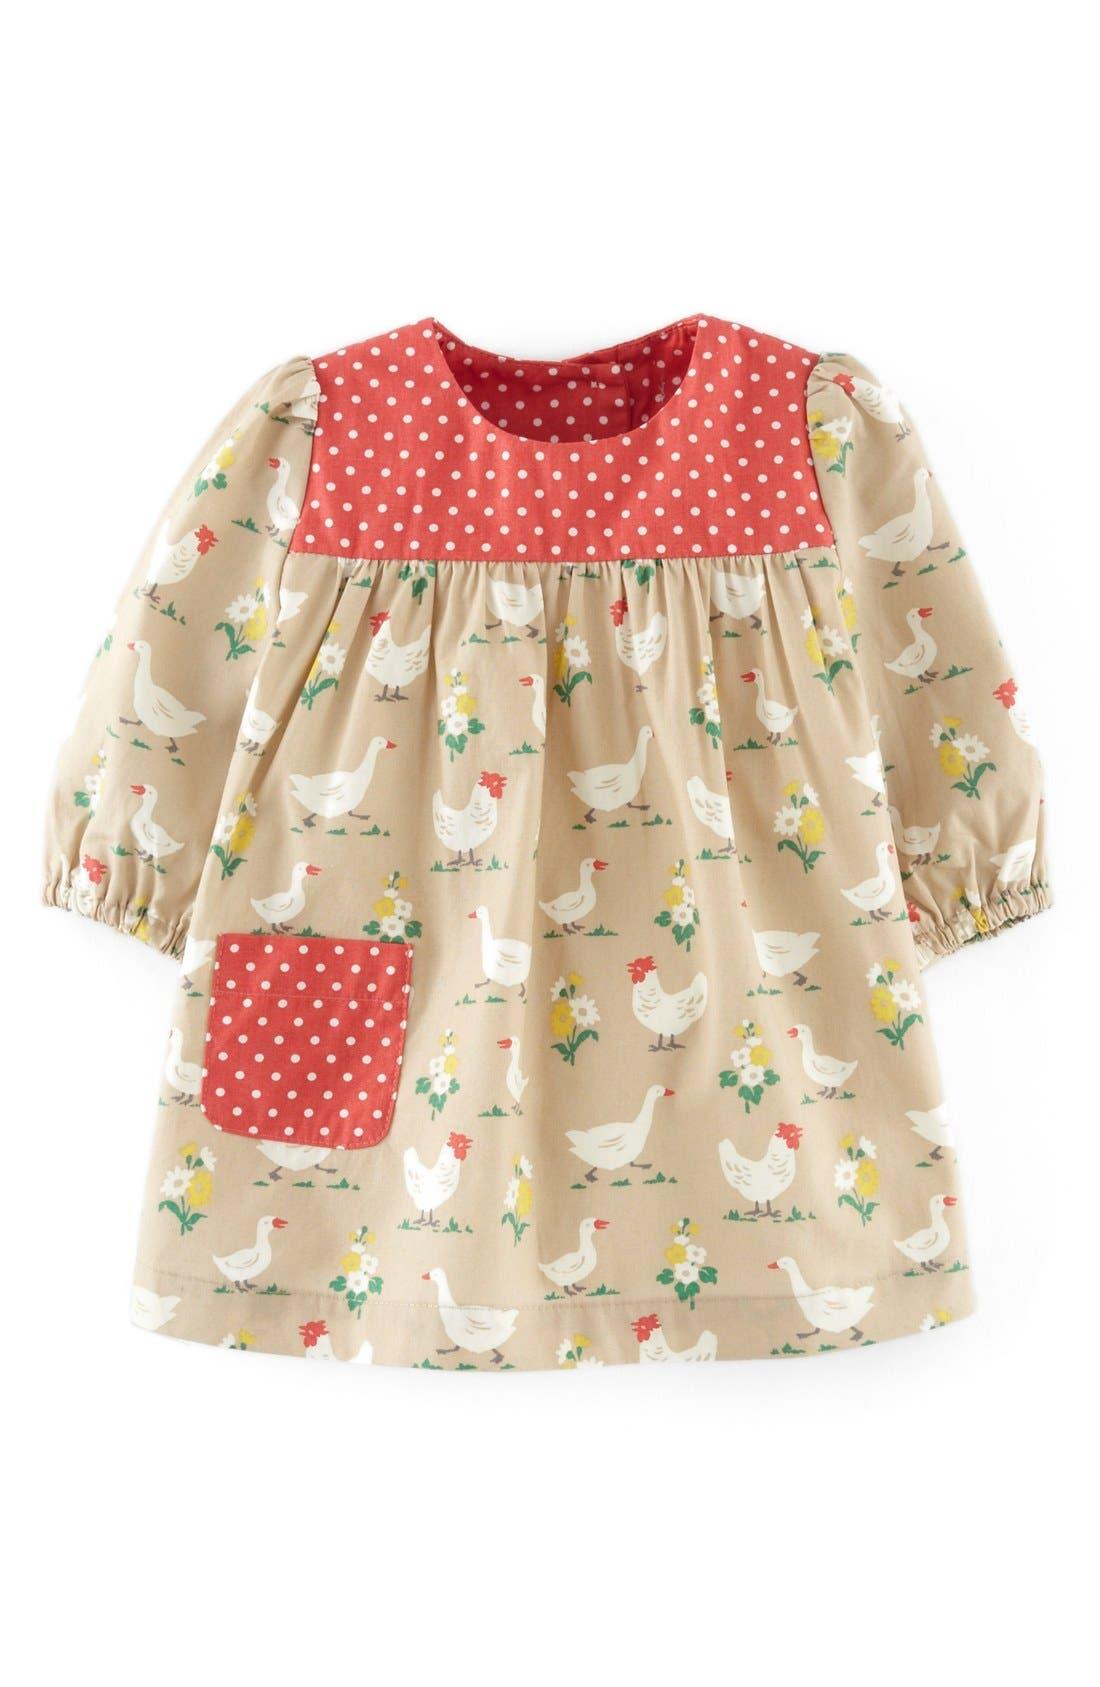 Main Image - Mini Boden Hotchpotch Dress (Baby Girls)